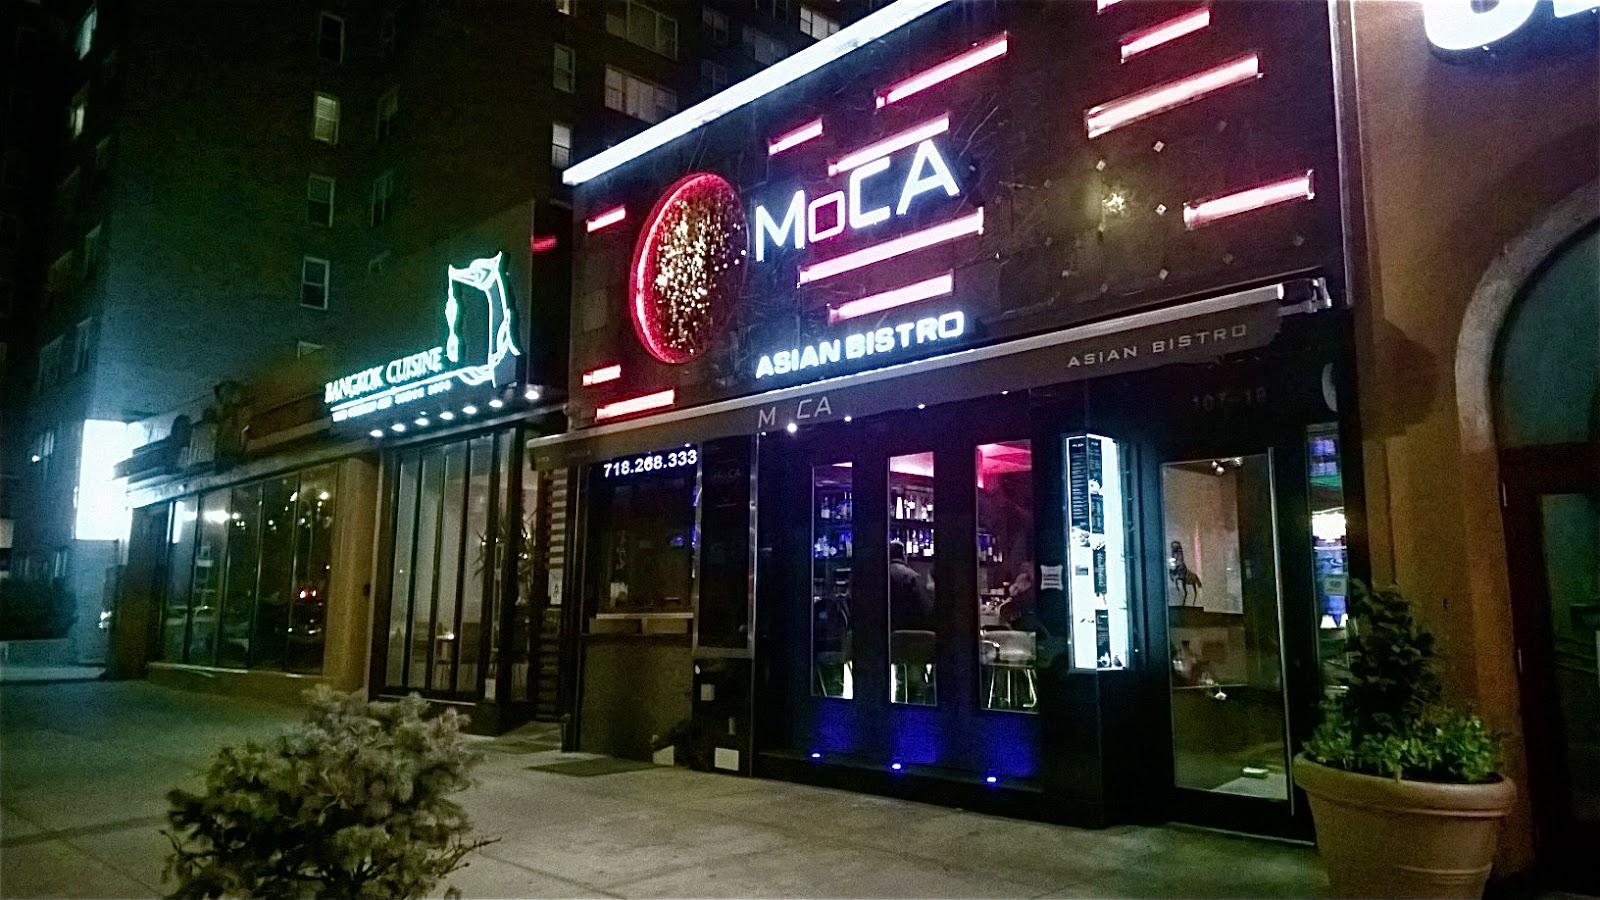 MoCA Asian Bistro - Modern Concepts Culinary Arts